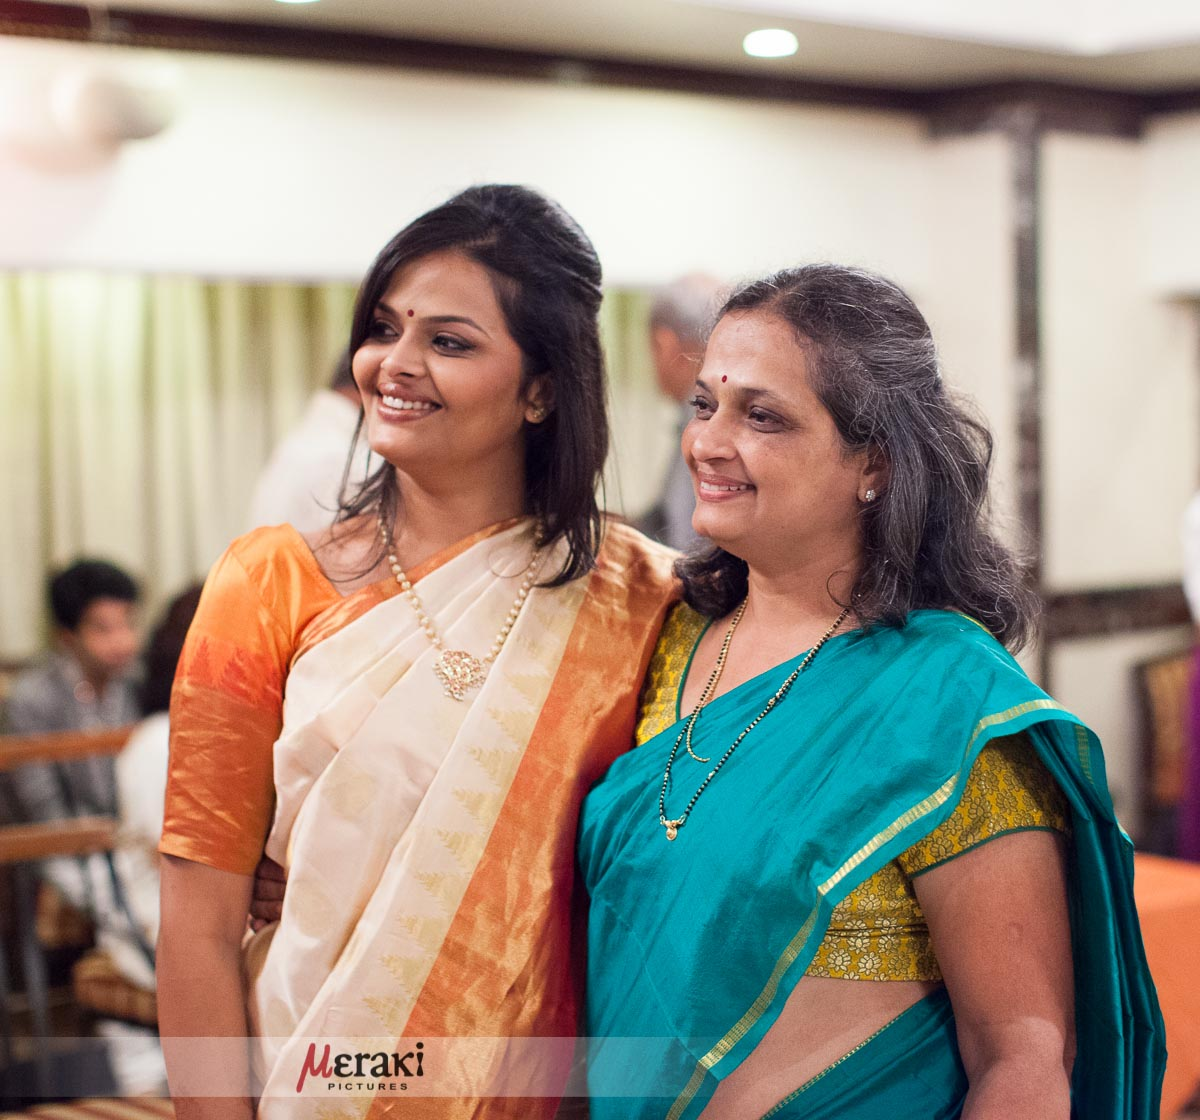 003-_MG_1488-maithili-ajinkya-engagement-portfolio